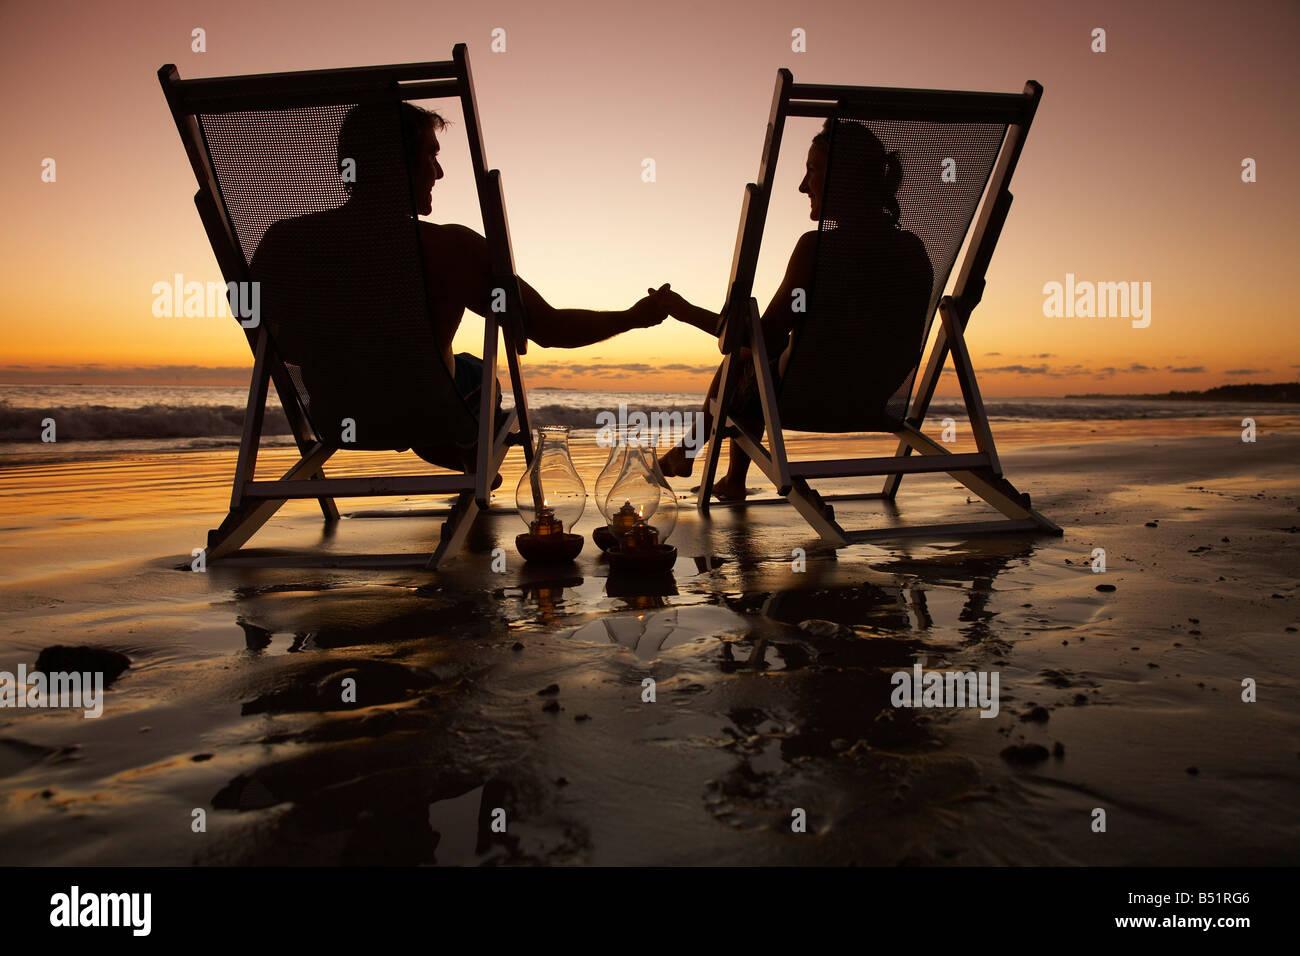 Paar, sitzen in Liegestühlen am Strand bei Sonnenuntergang, Mexiko Stockfoto